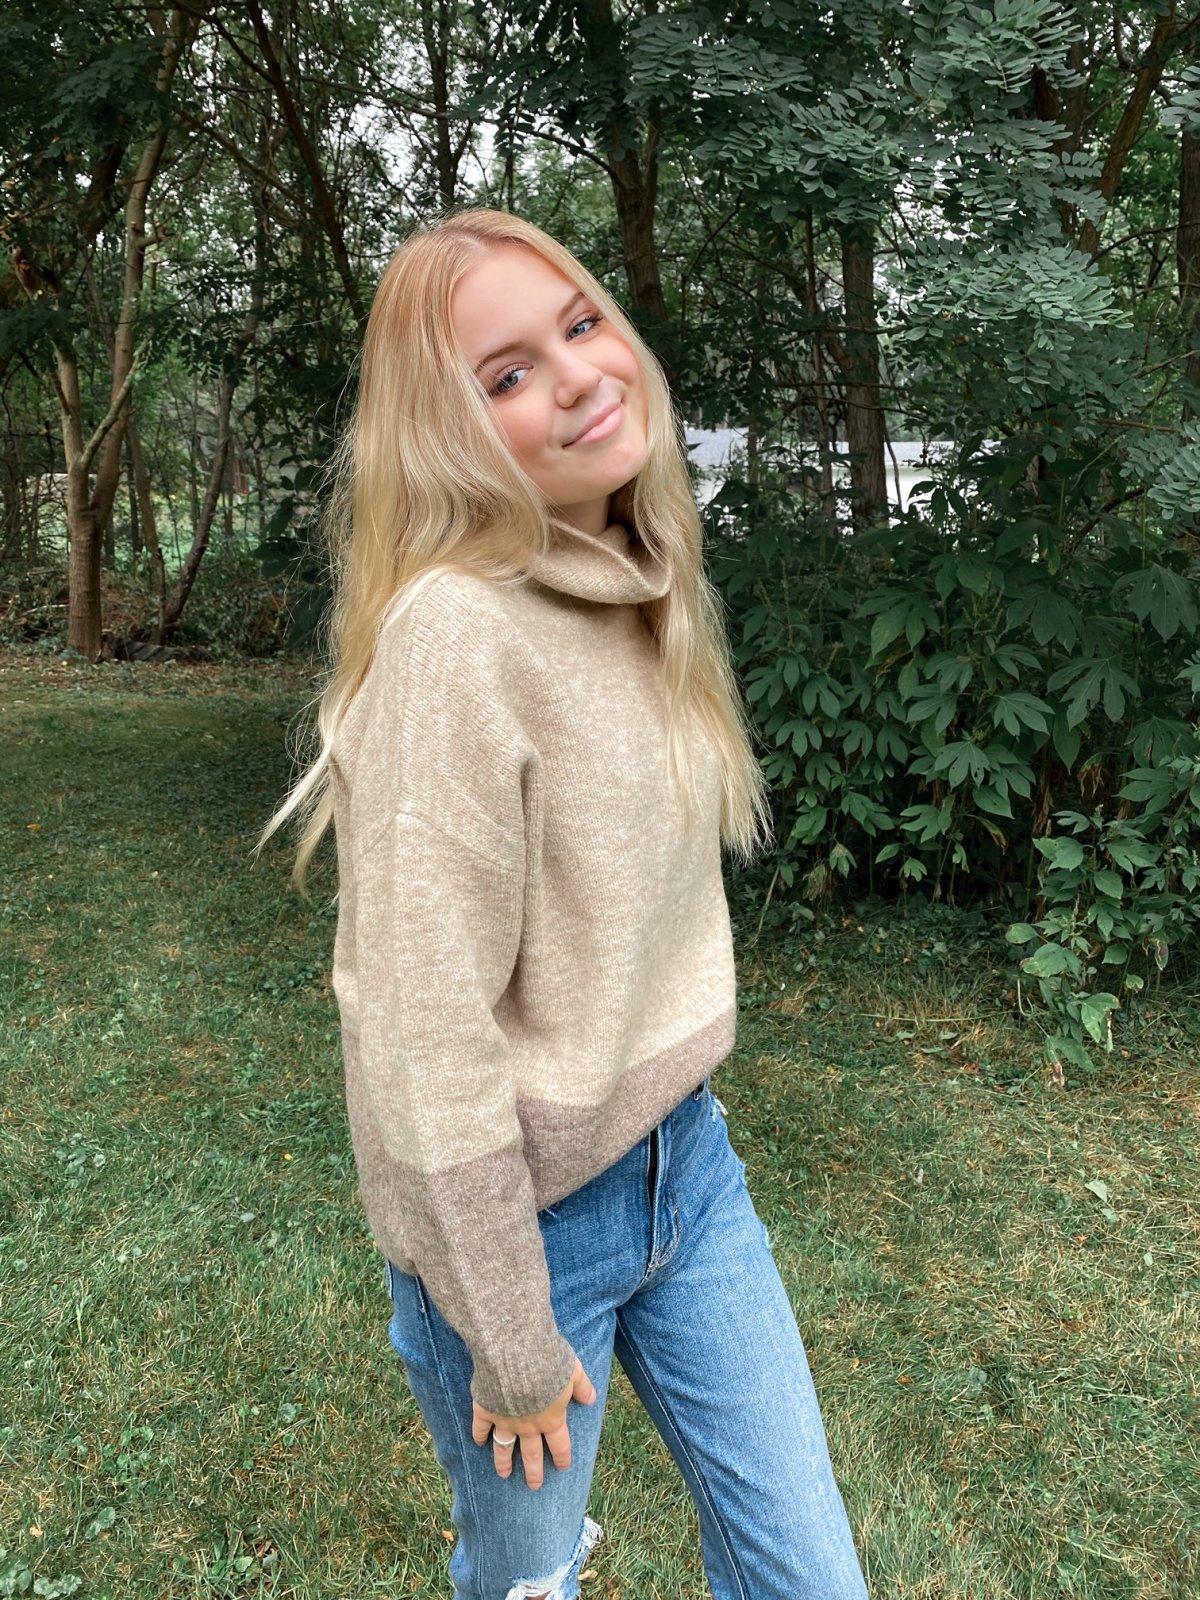 KK 2 Tone Tan/Taupe Dolman Mock Cowl Boxy Sweater